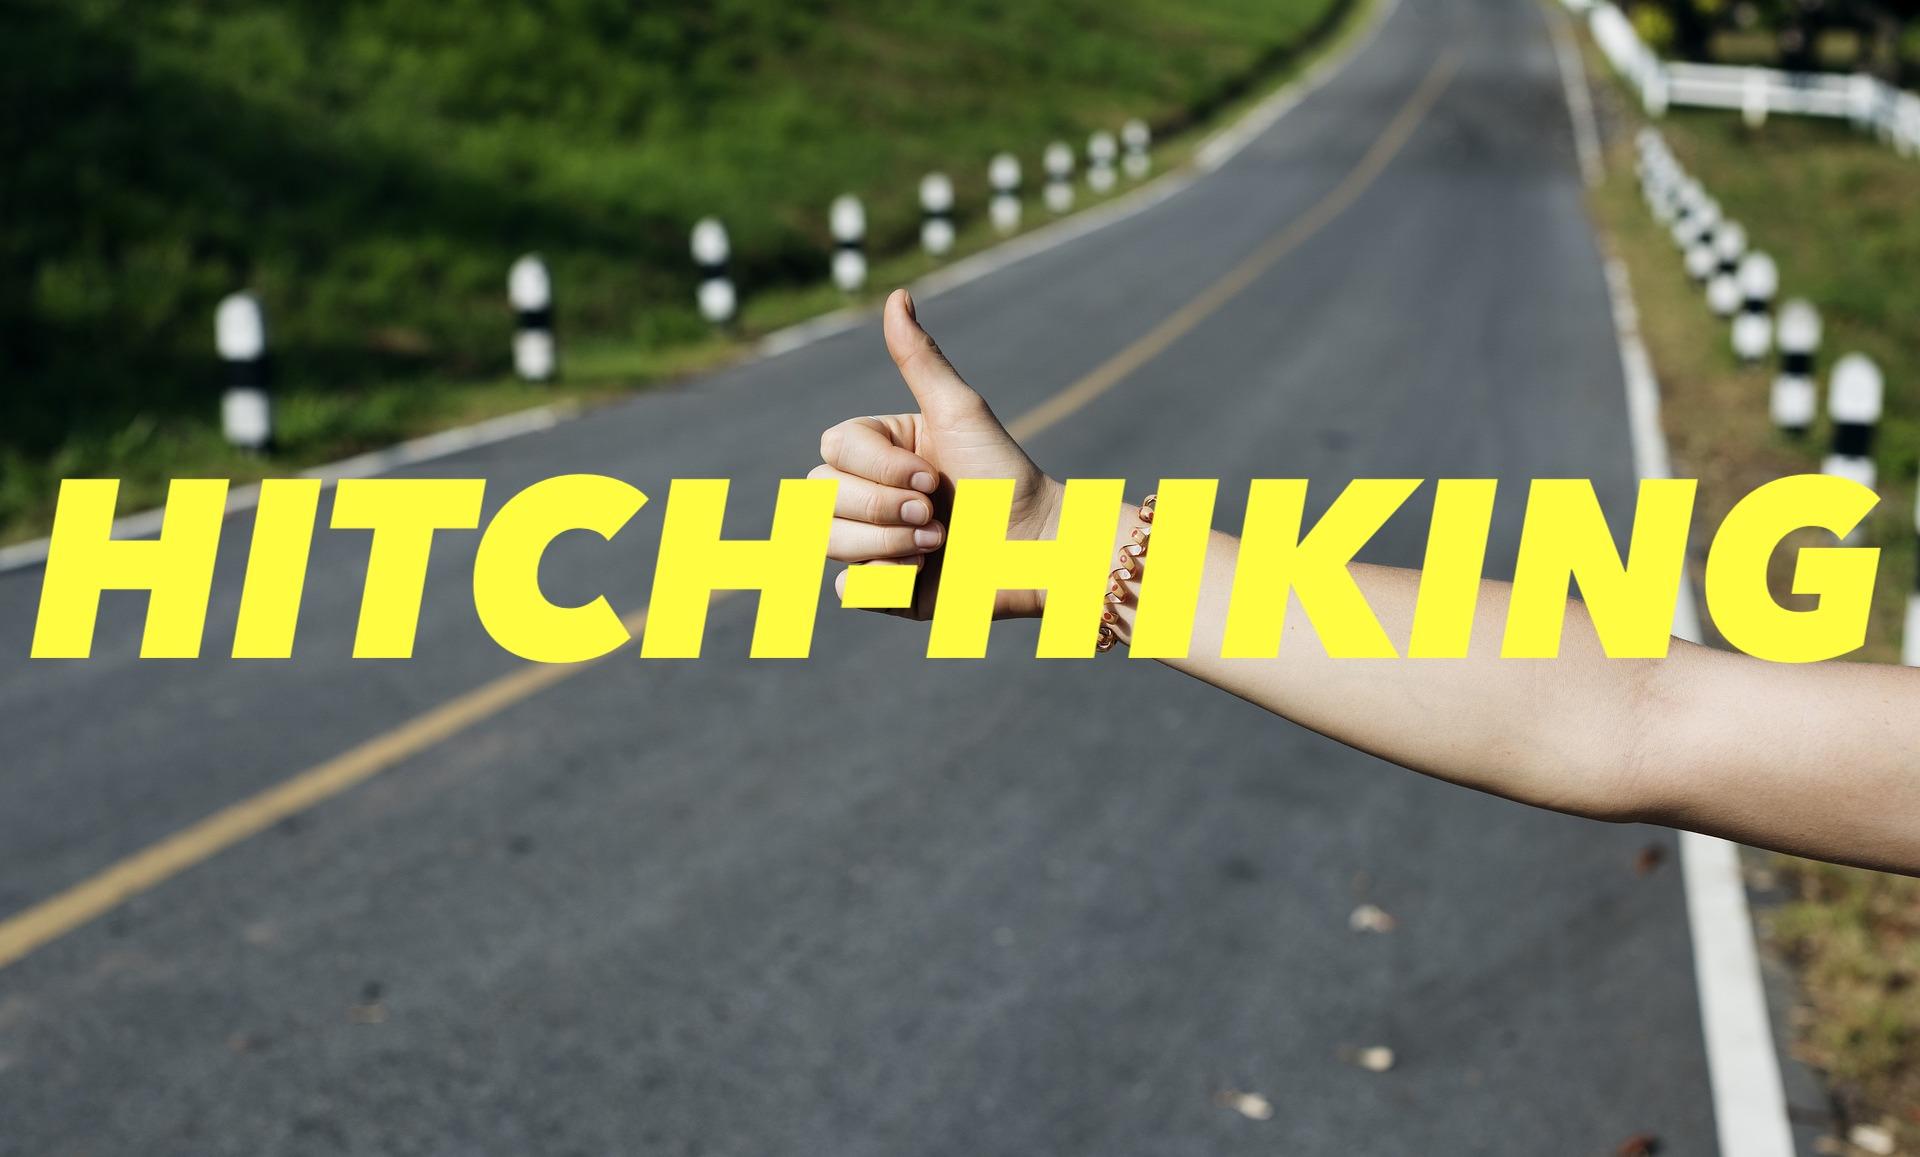 hitchhiking.jpg